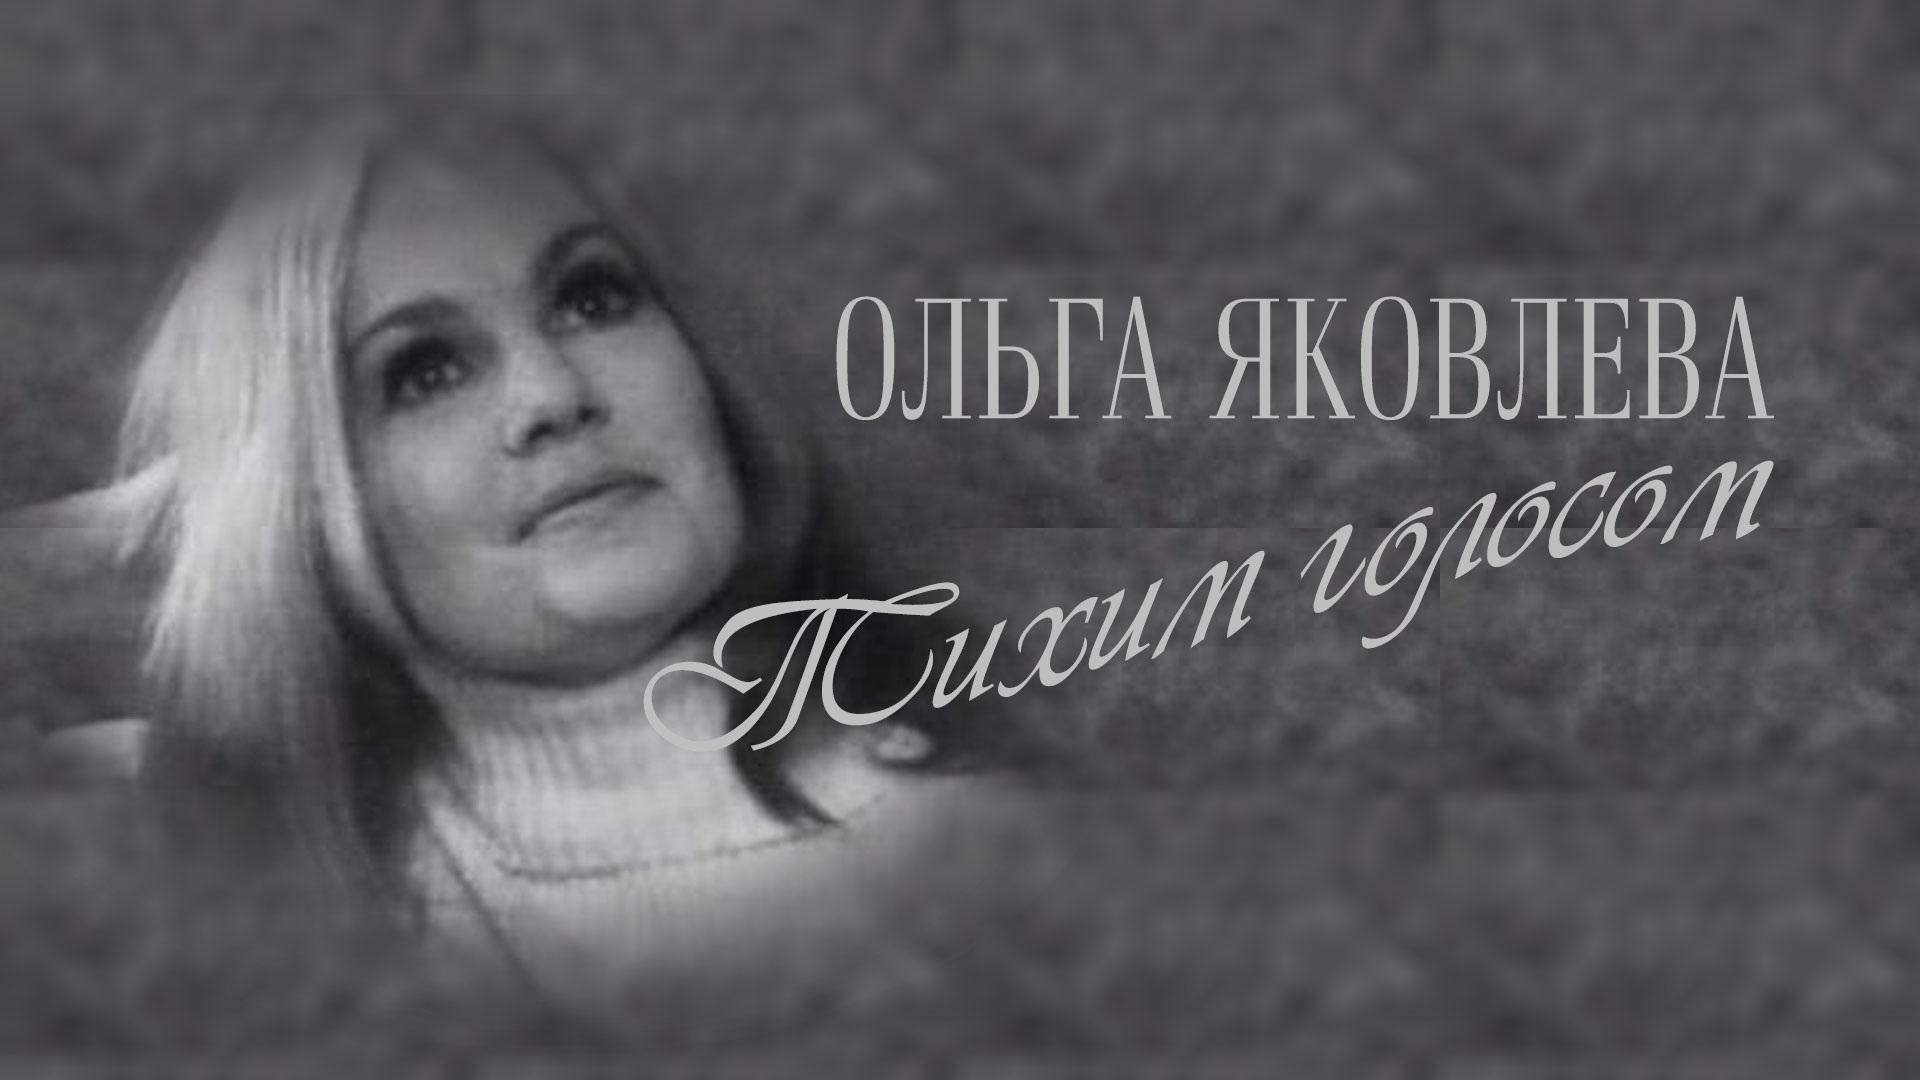 Ольга Яковлева. Тихим голосом